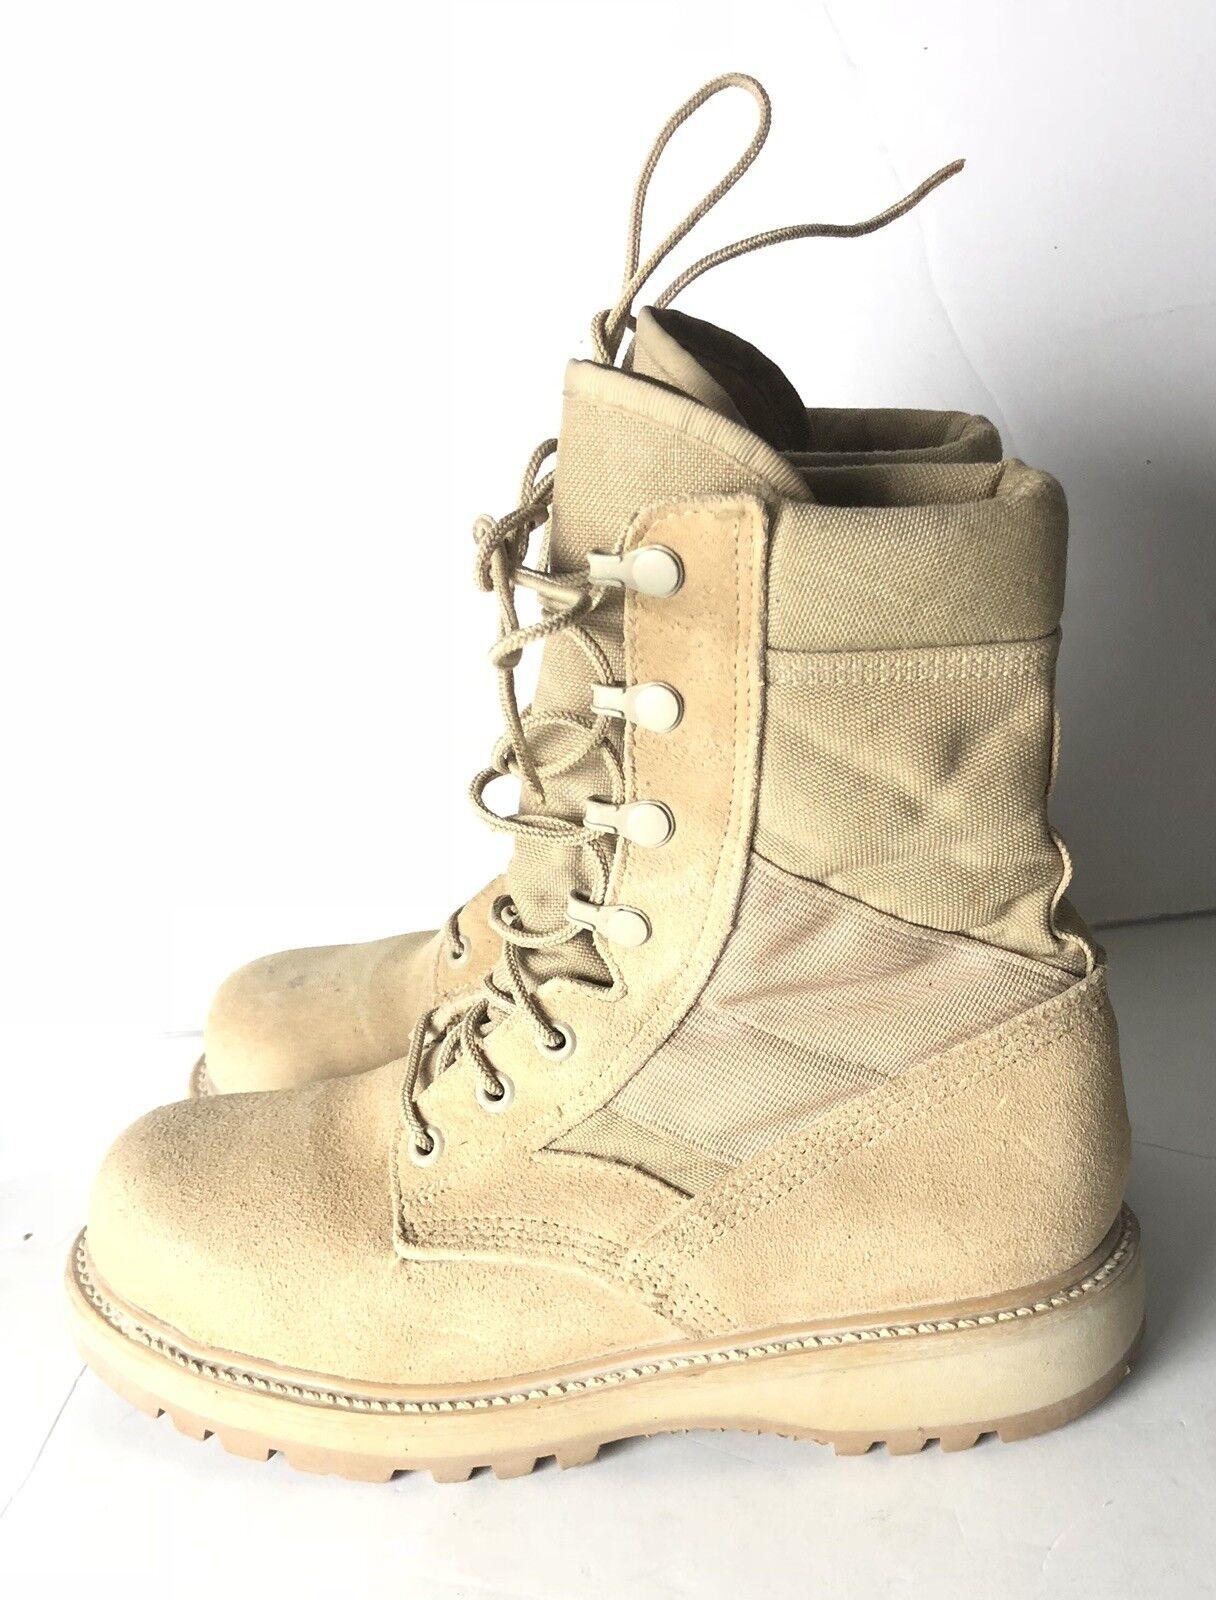 Men's 6R US Army Desert Tan Hot Weather Boots, Vibram Sole, USGI, Steel Toe